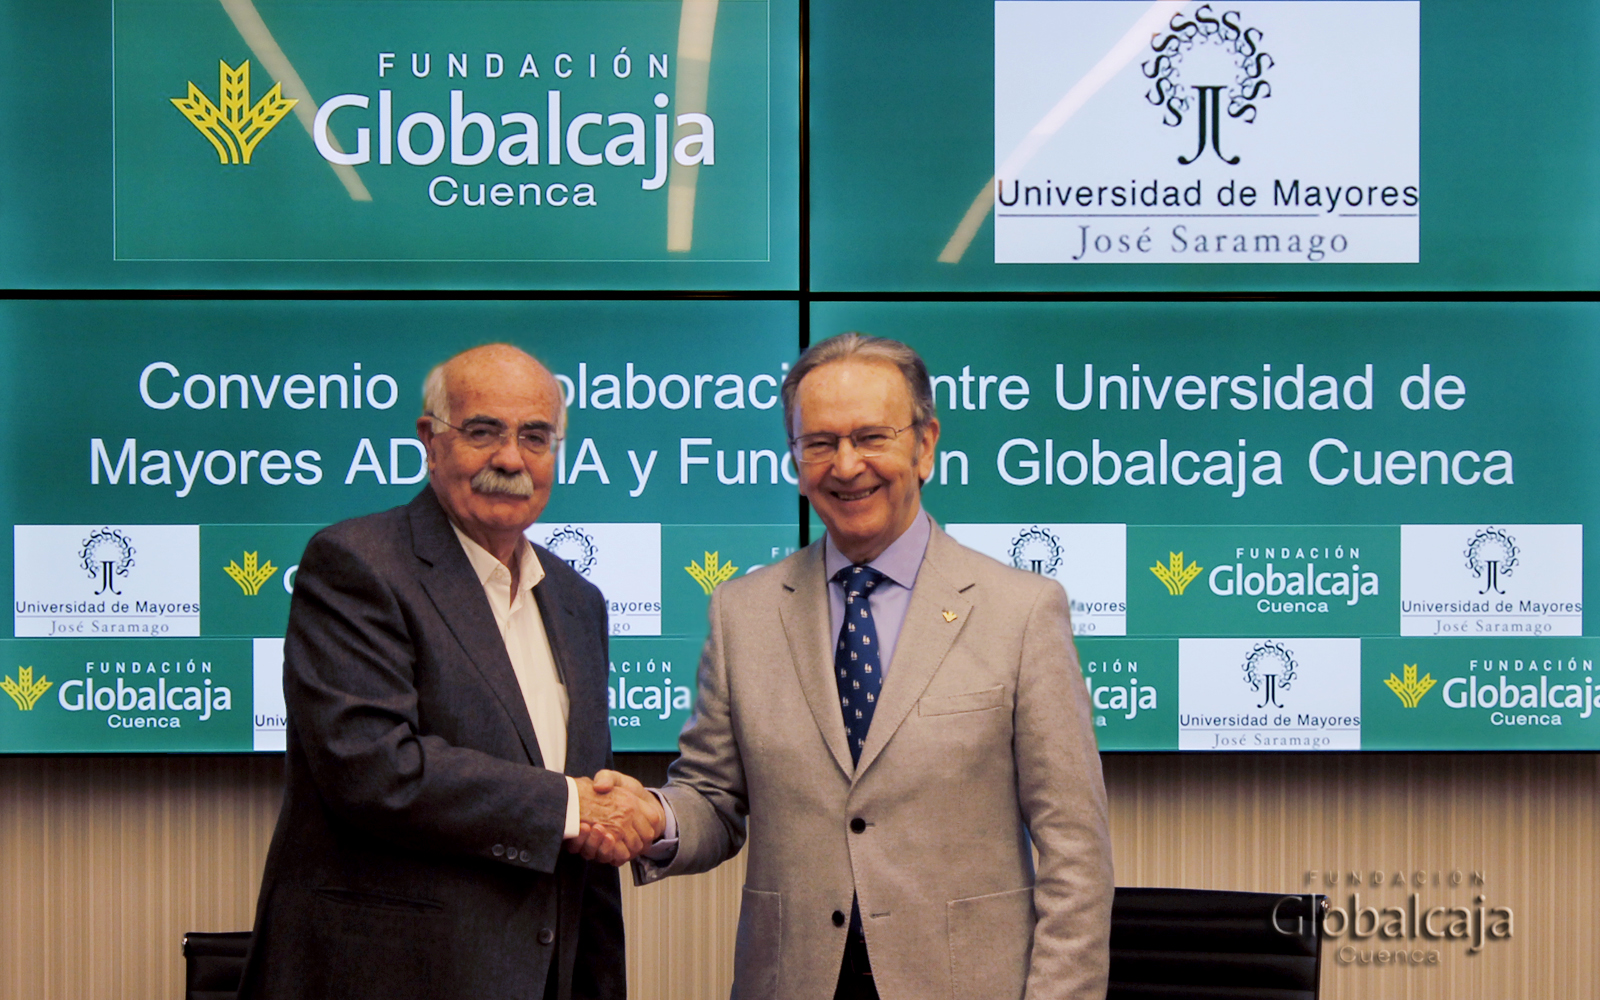 https://blog.globalcaja.es/wp-content/uploads/2018/05/MG_9787_W.jpg